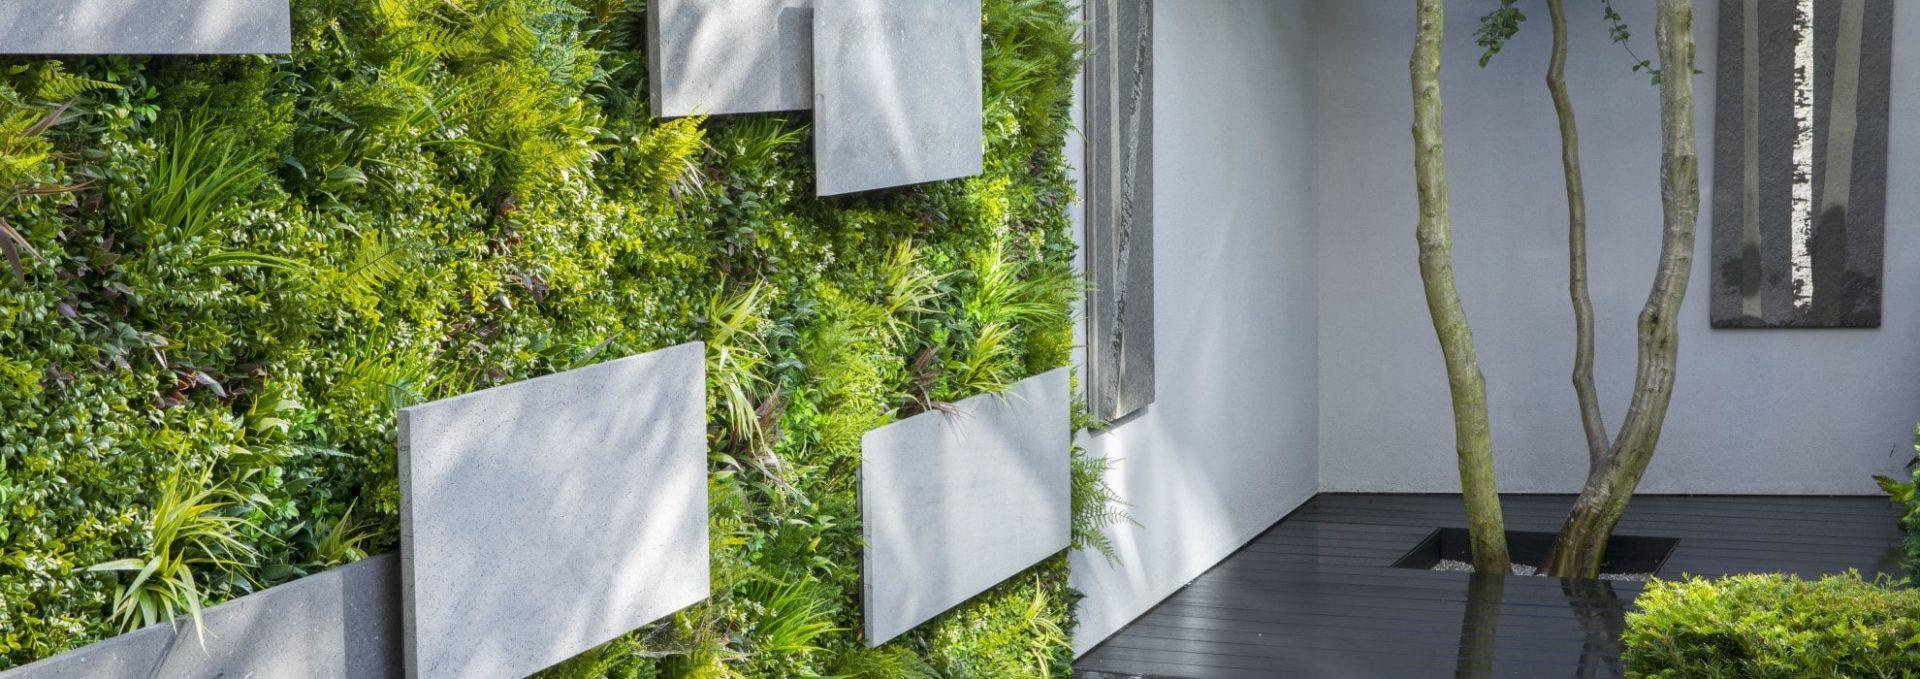 Stylish Artificial Green Wall